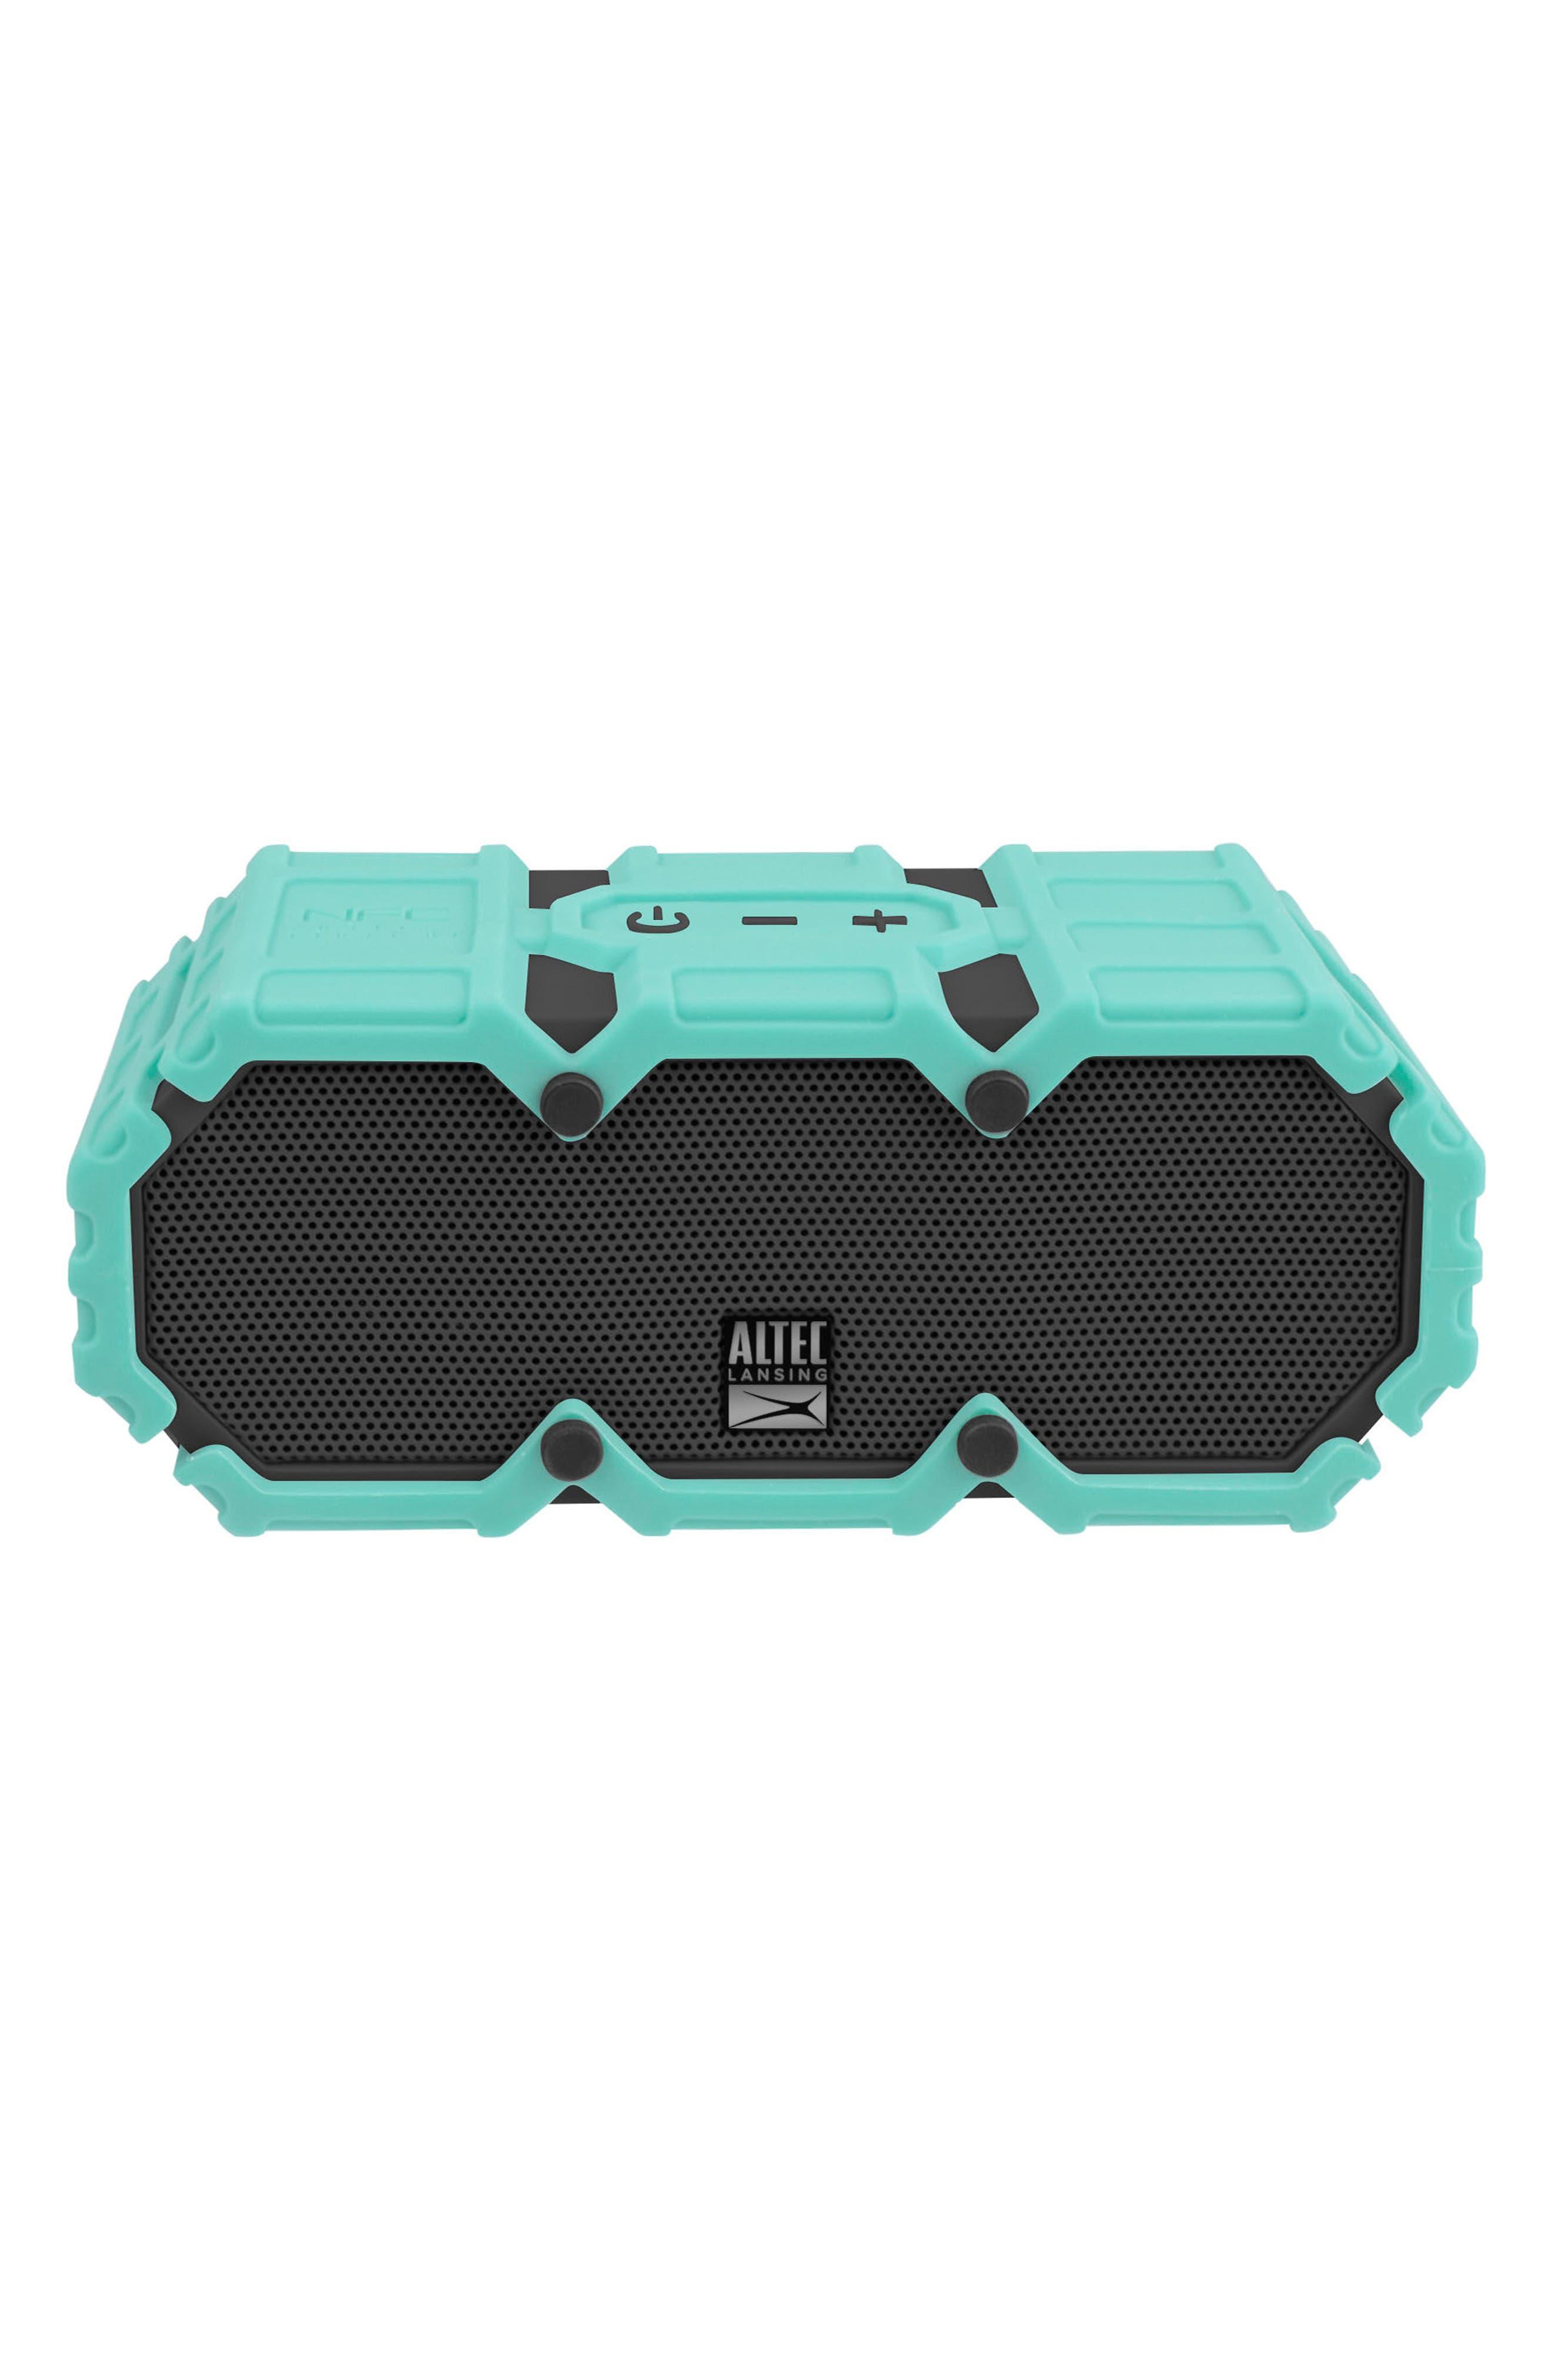 Mini Lifejacket S3 Waterproof Wireless Speaker,                             Main thumbnail 1, color,                             MINT GREEN/ DARK GREY